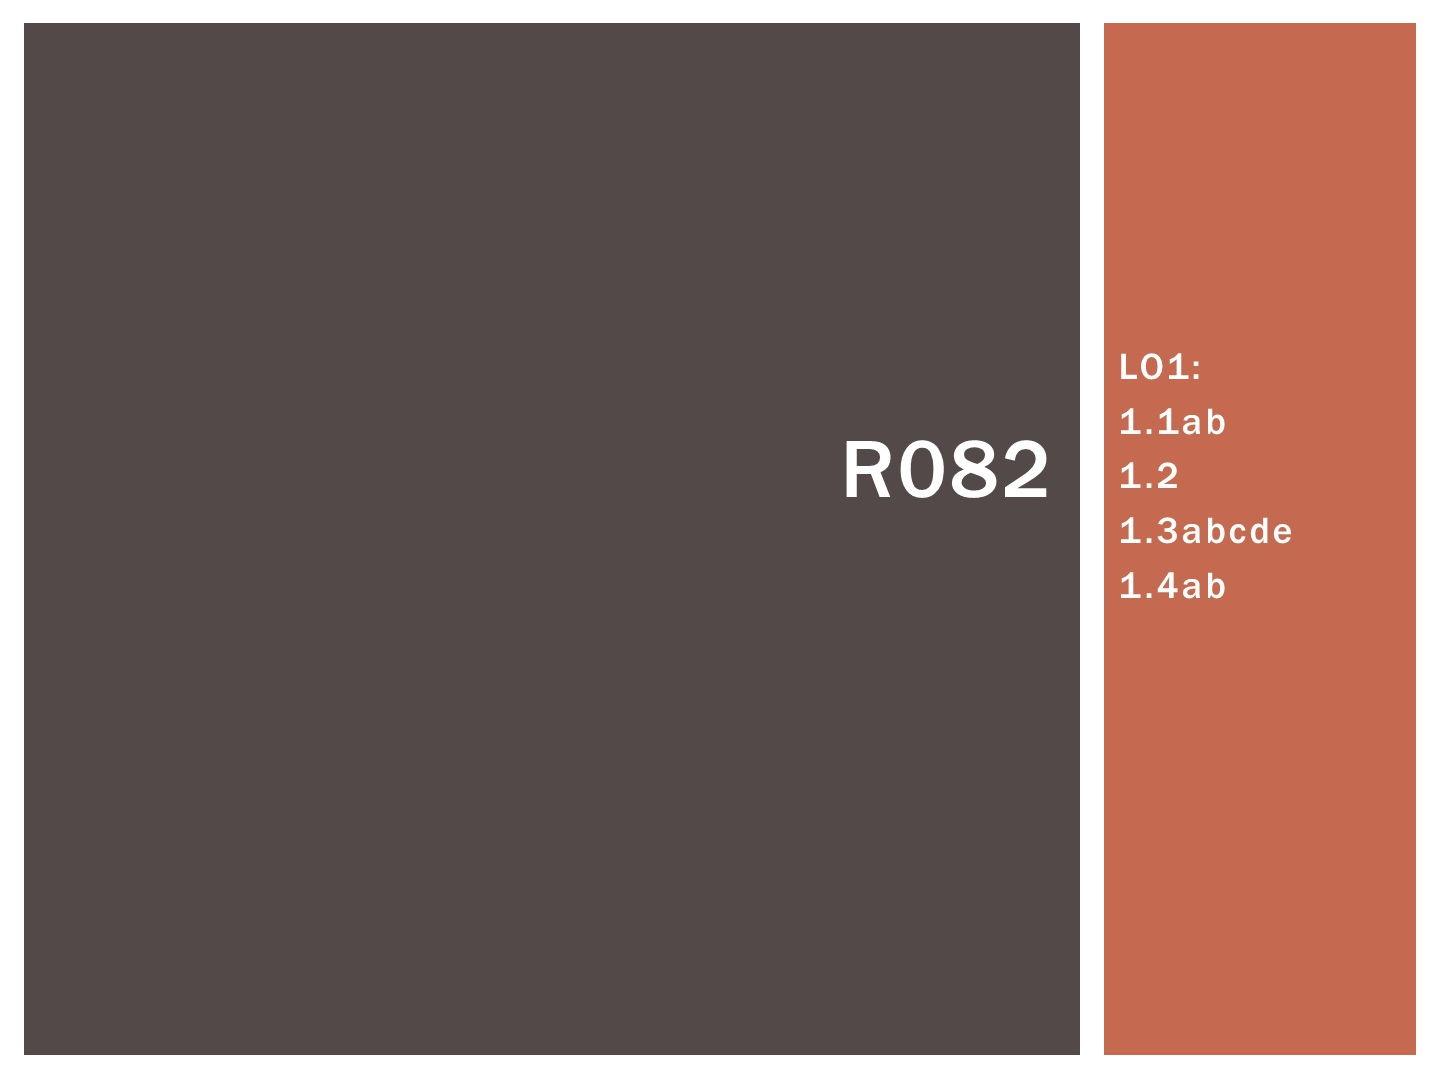 R082 - Creating Digital Graphics, [LO1], CAMNATS, Creative iMedia Lvls 1/2